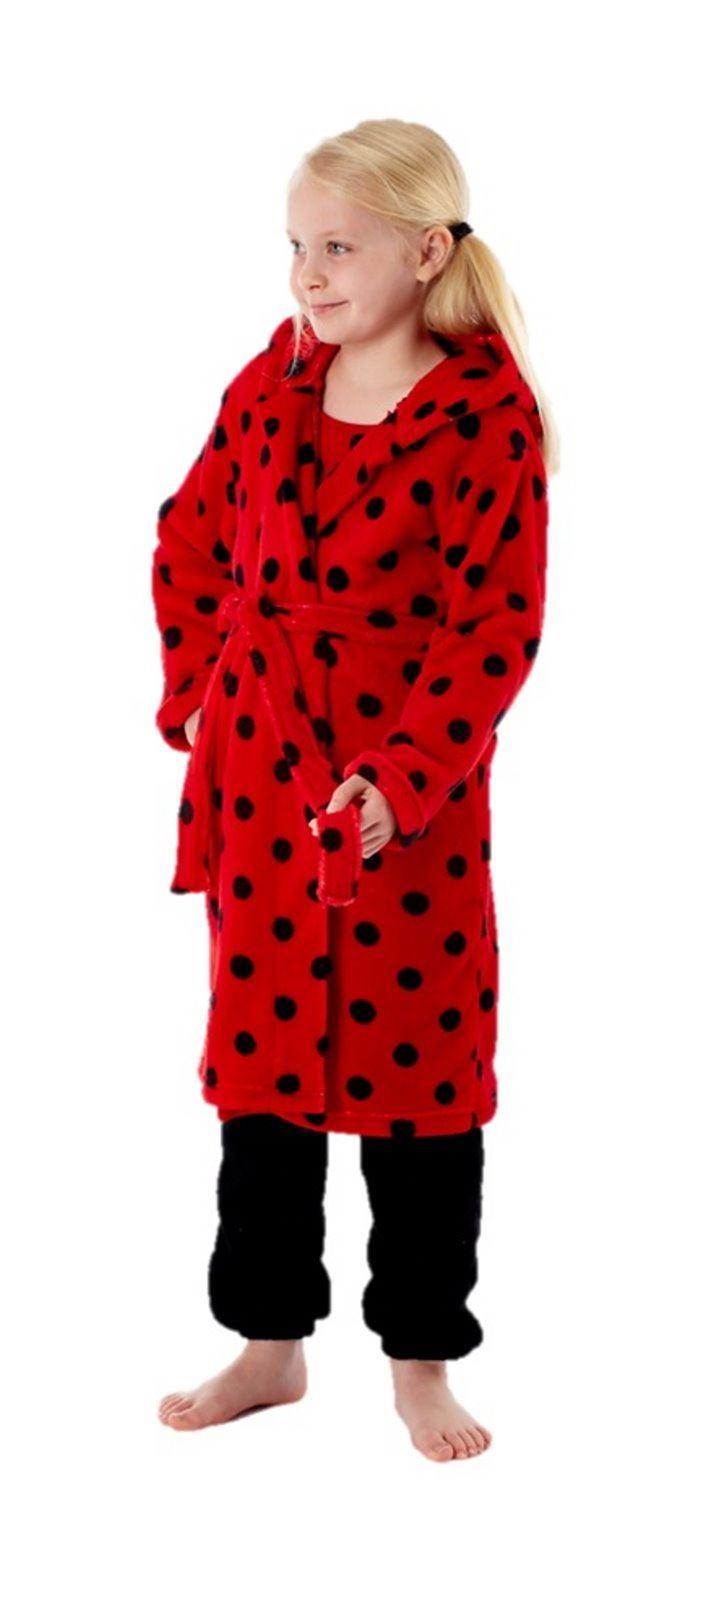 Panda Dressing Gown - Best Ideas Gowns